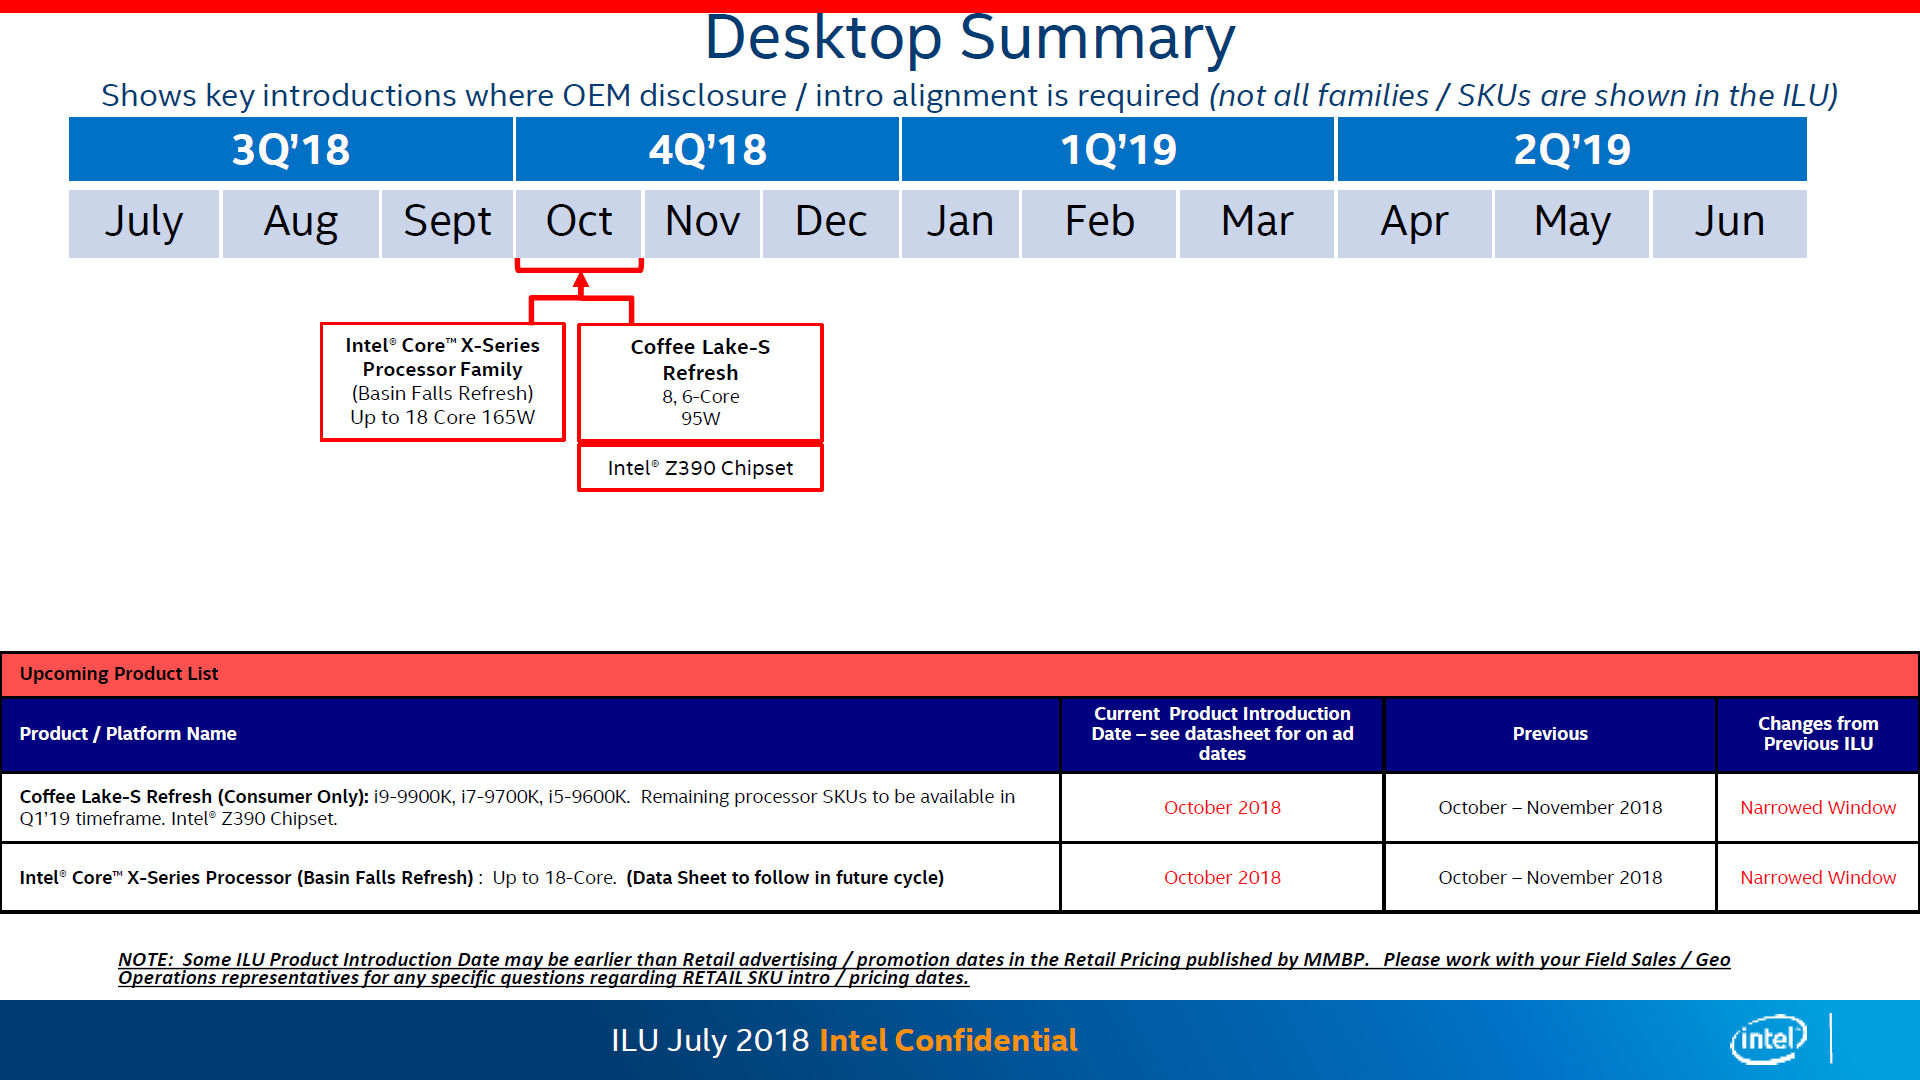 Fresh leaks confirm Intel Core i9-9900K, Core i7-9700K, Core